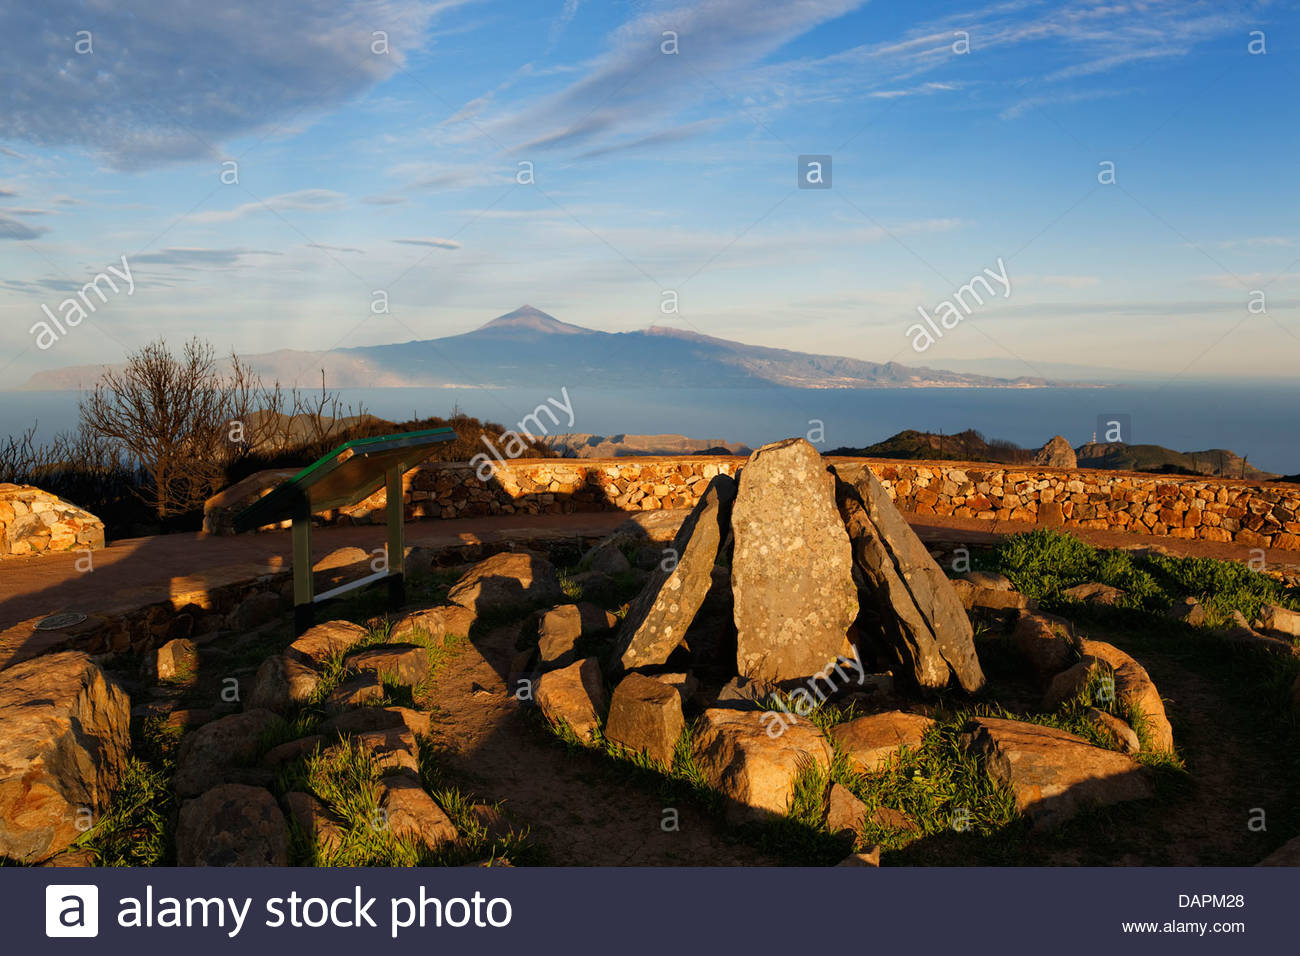 Spain, La Gomera,  Reconstruction of ritual place at peak of Alto de Garajonay - Stock Image